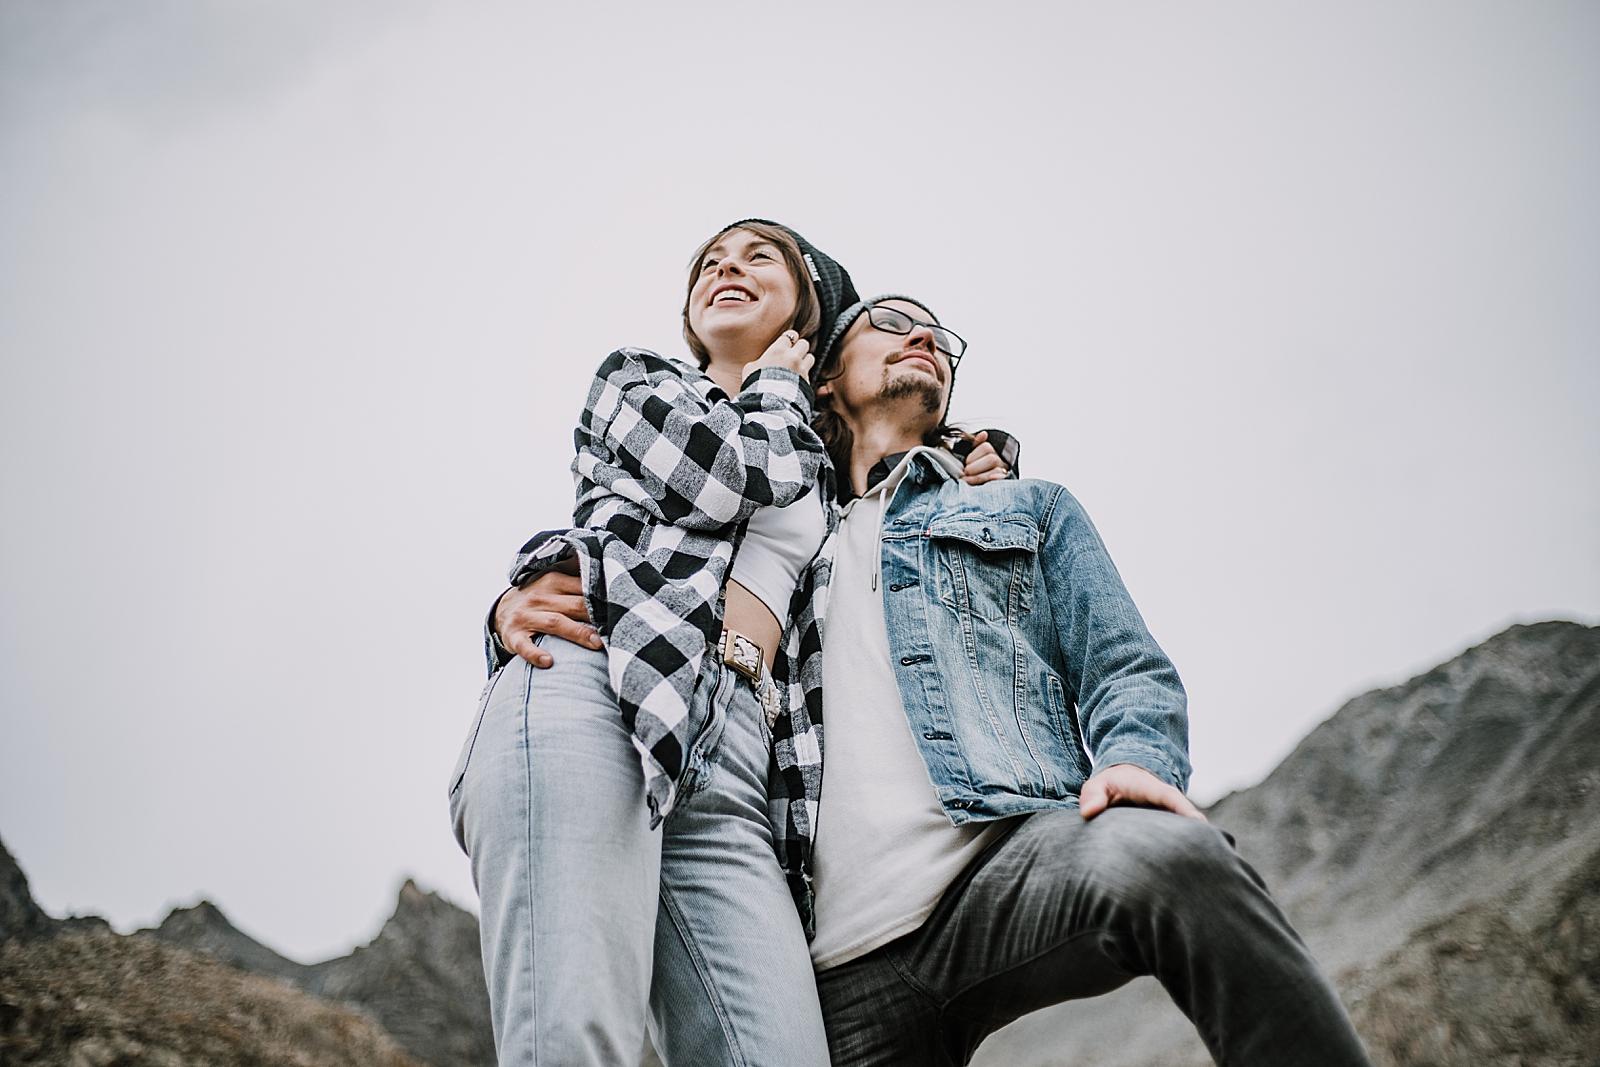 hipster couple, colorado surprise proposal, hike mayflower gulch, mayflower gulch proposal, mayflower gulch elopement, mayflower gulch wedding, colorado mountainscape, leadville elopement